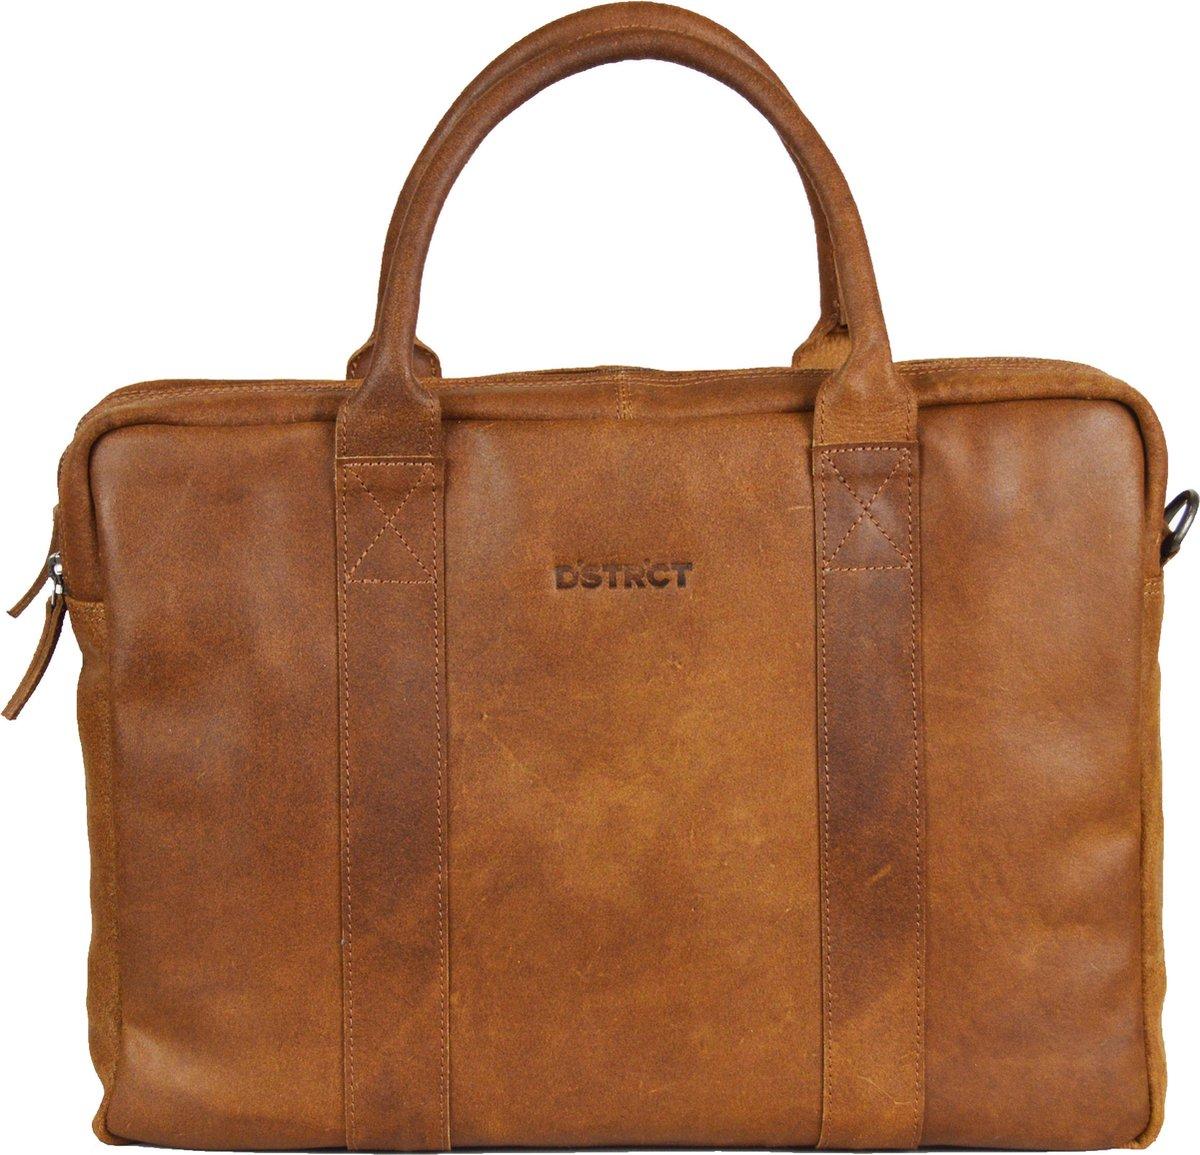 DSTRCT Limited Leren Laptoptas - 15,6 inch - Bruin